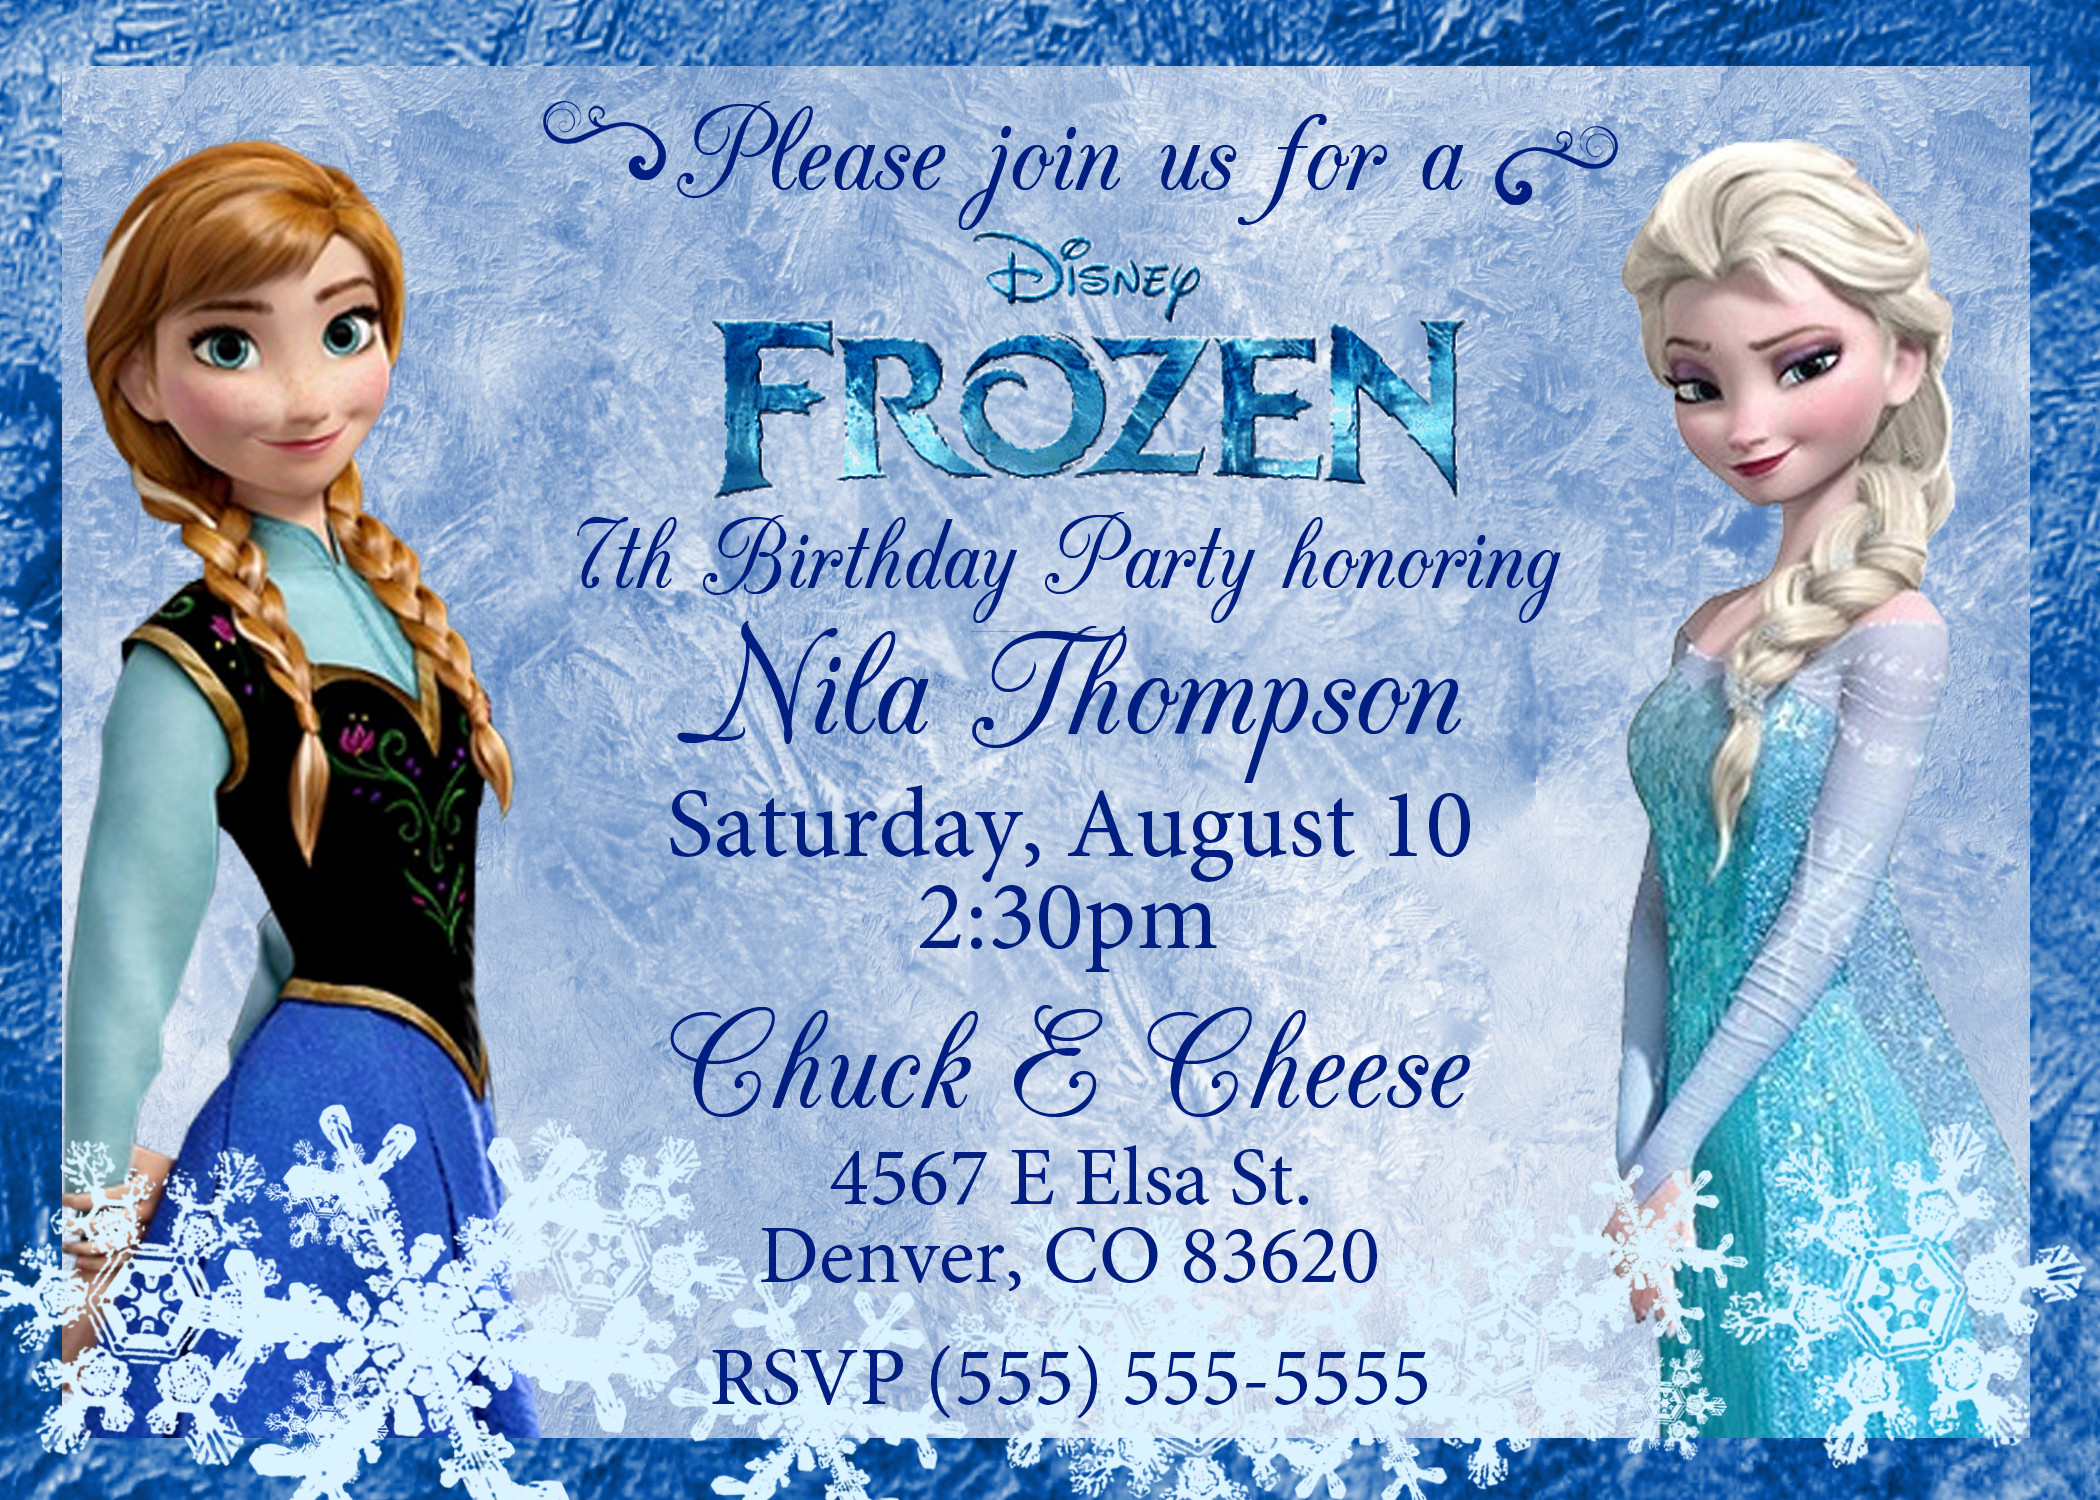 Best ideas about Frozen Birthday Party Invitations . Save or Pin Frozen 2013 Birthday Invitation Now.